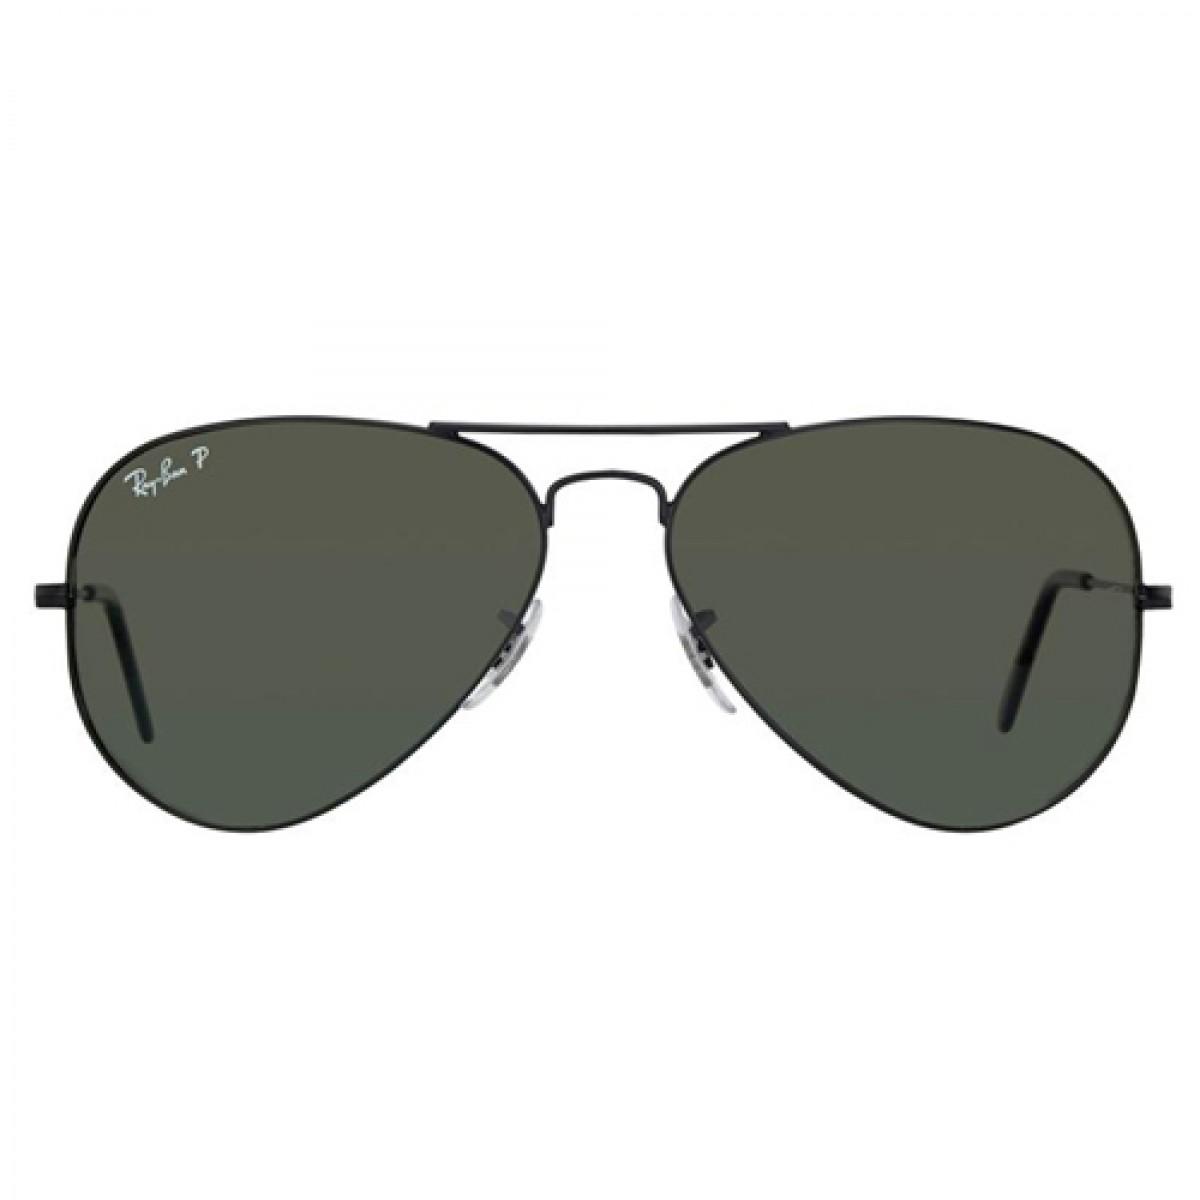 Ray Ban Classic Aviator Polarized Unisex Sunglasses RB3025-001 58 2458f0a669